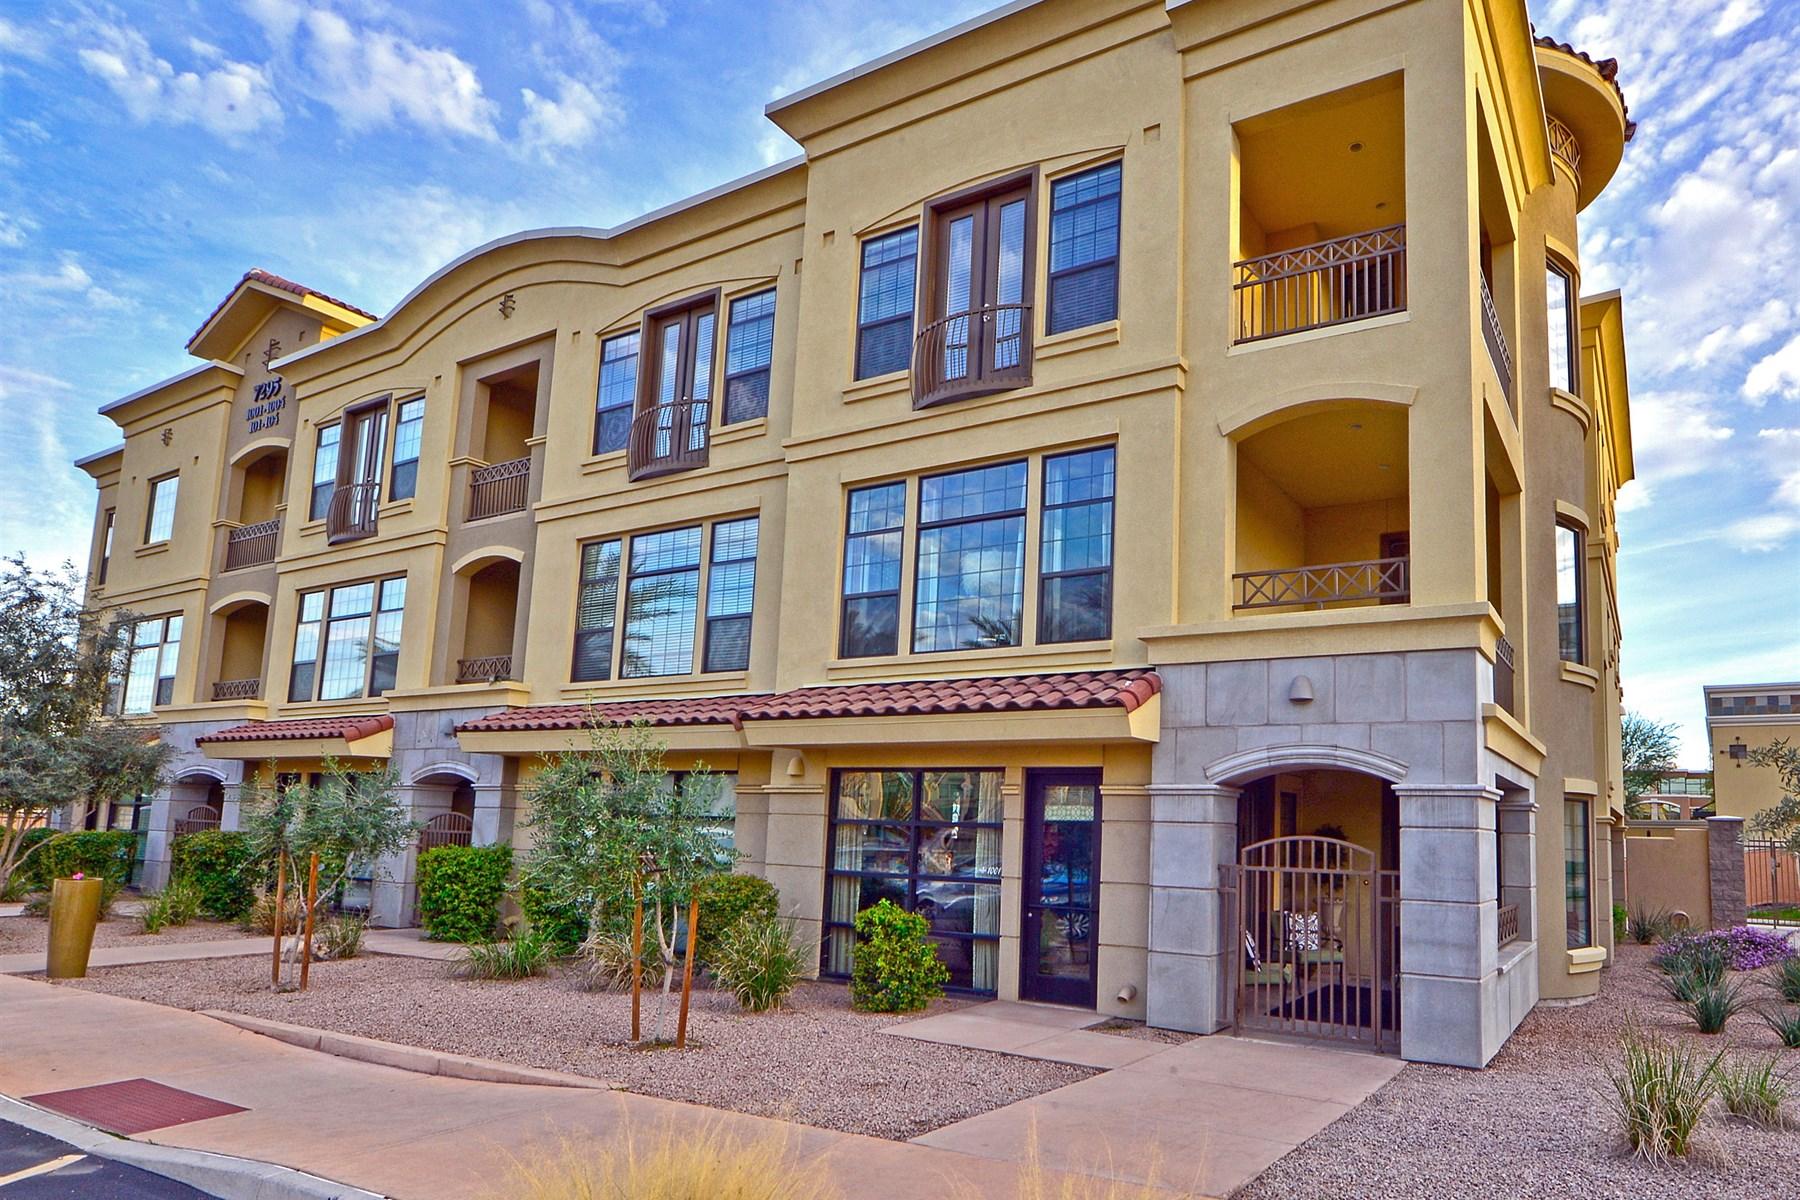 Moradia em banda para Venda às Elegant Live/Work Property in The Heart Of The Scottsdale Retail/Resort Corridor 7295 N Scottsdale Rd #1001 Scottsdale, Arizona 85253 Estados Unidos